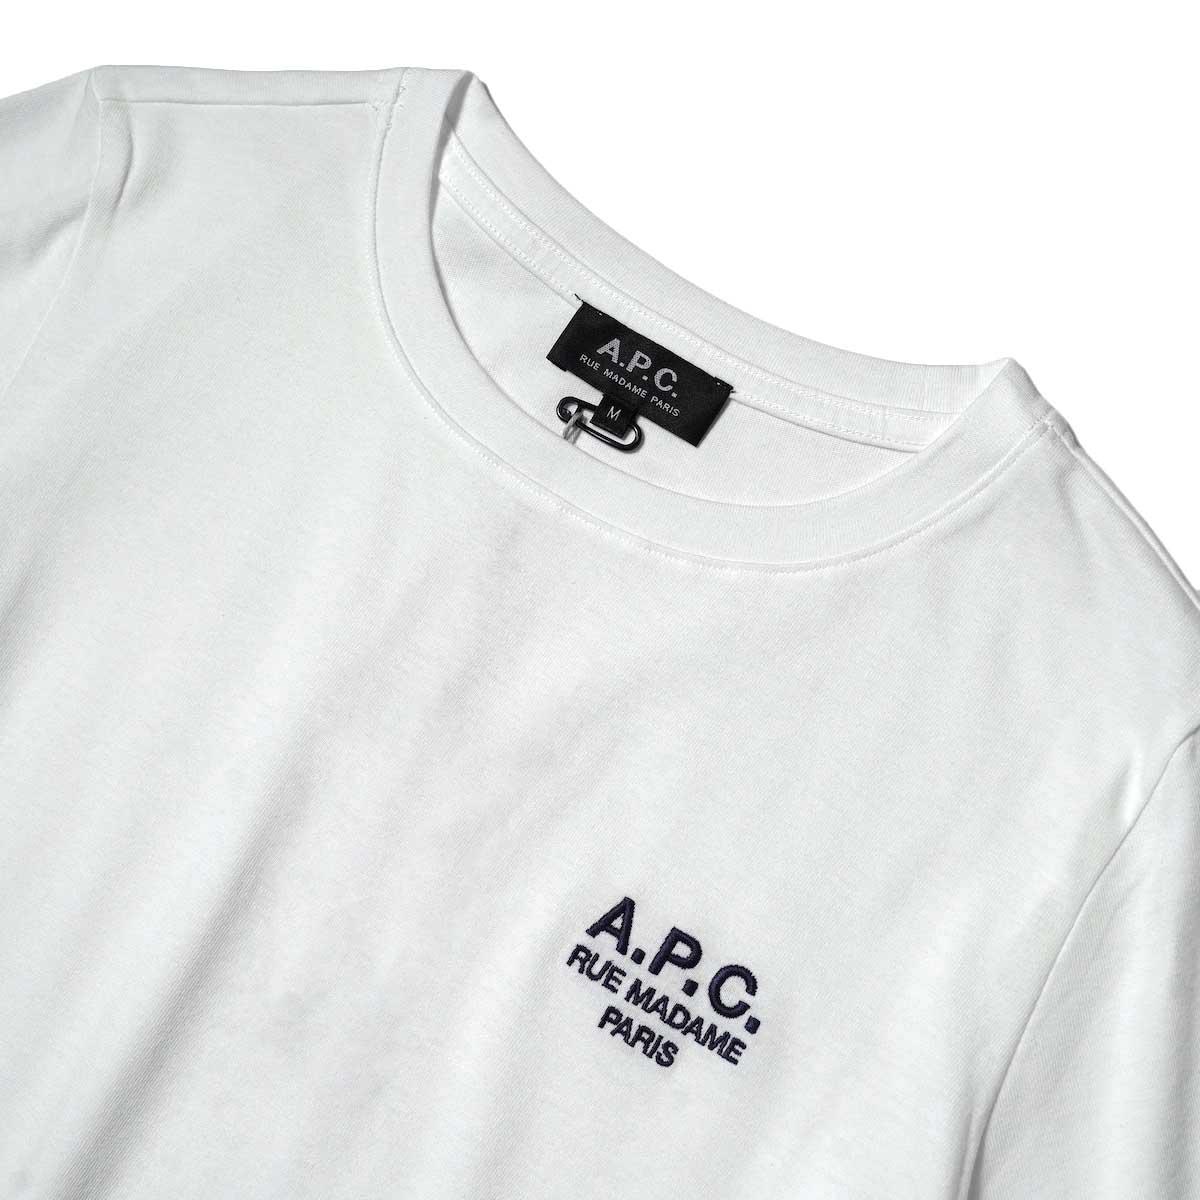 A.P.C. / Denise Tシャツ (White) フロント・刺繍